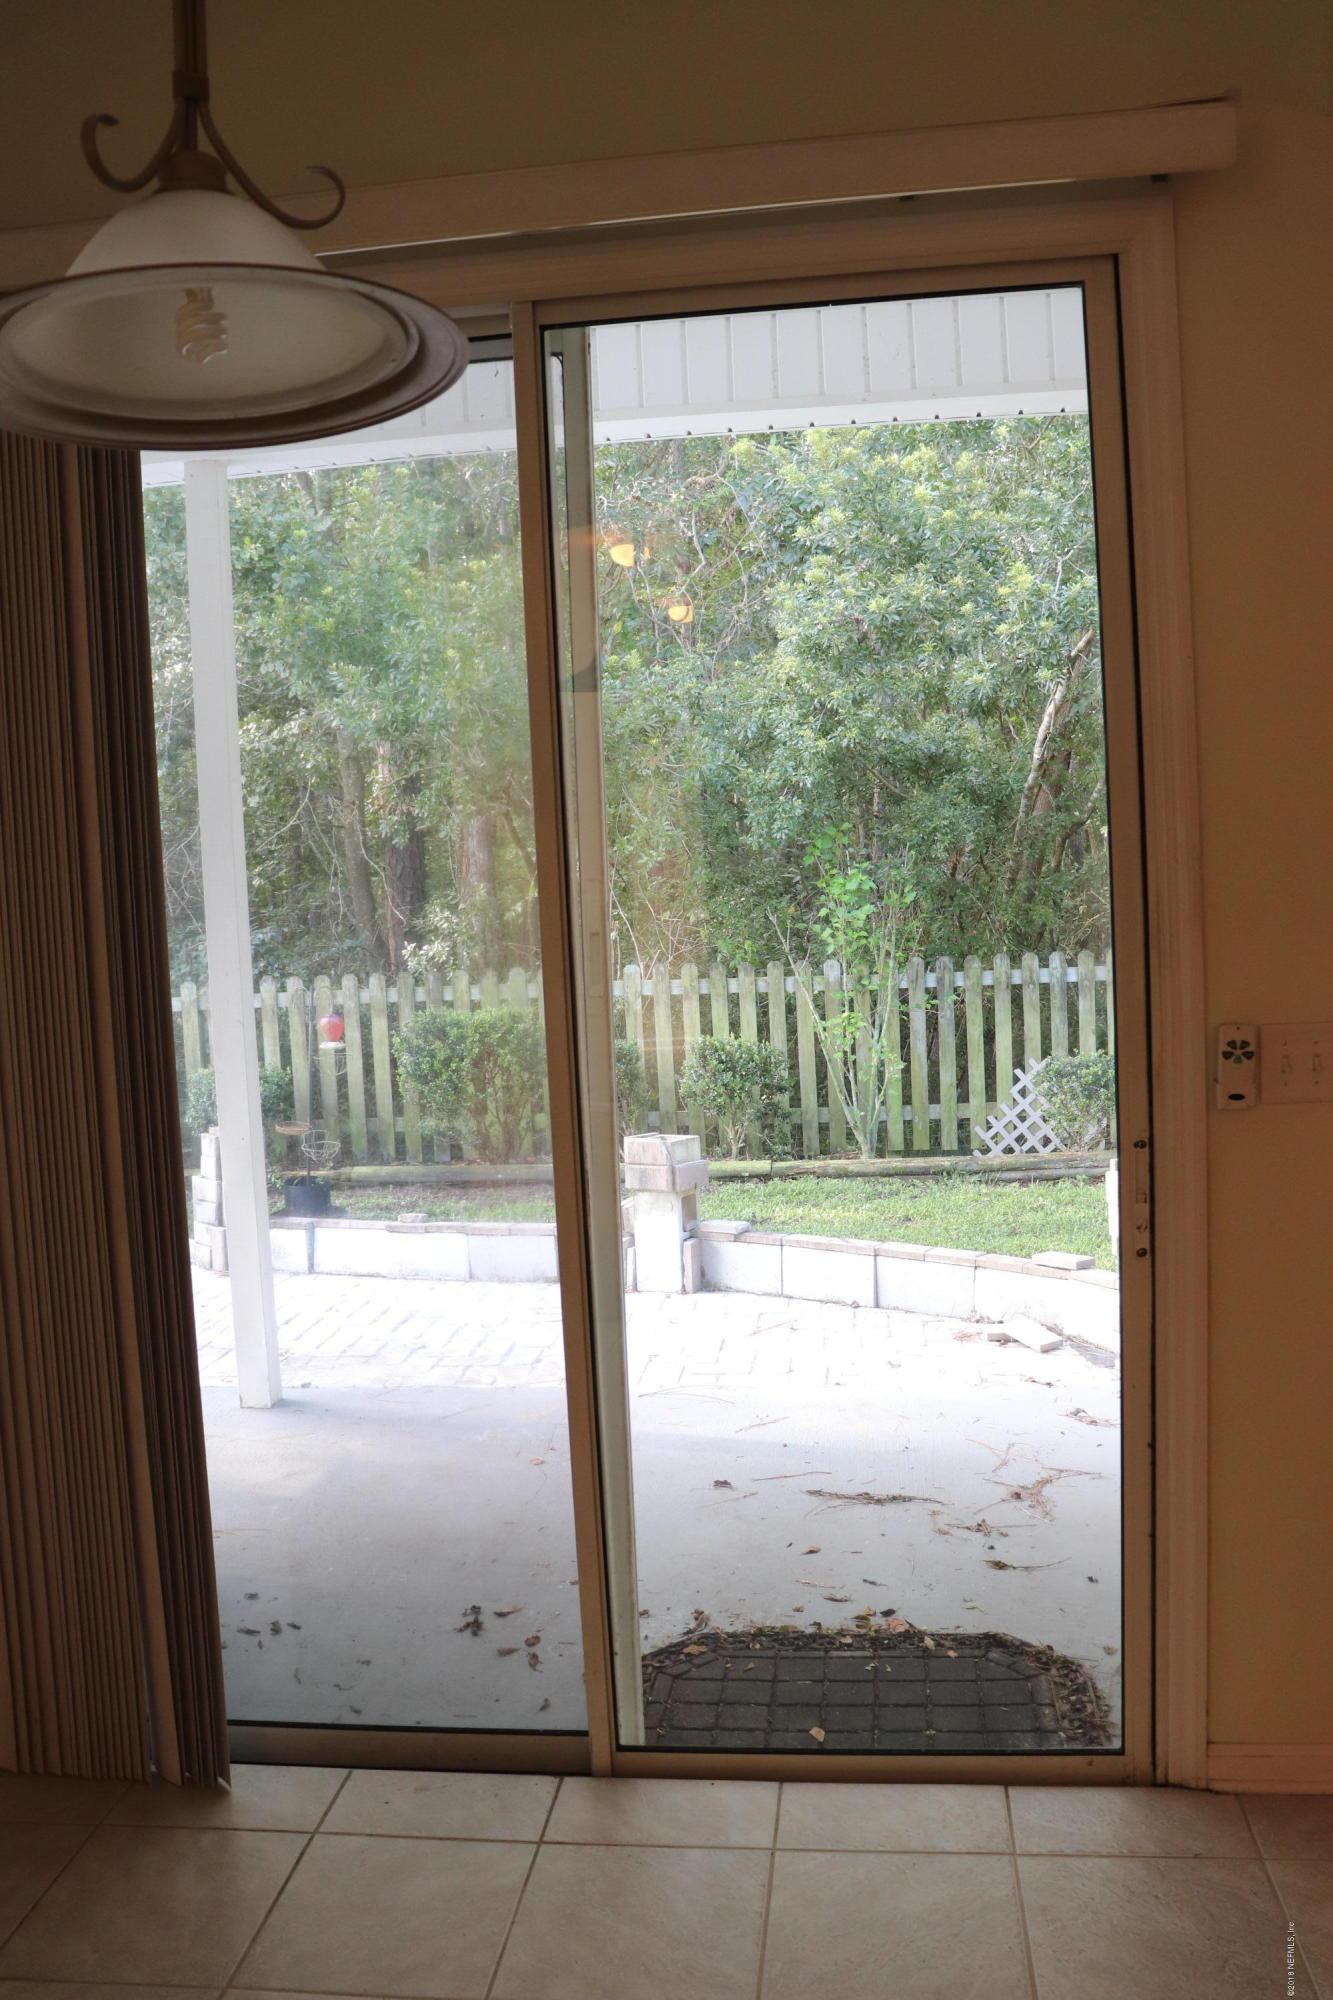 654 BONAPARTE, JACKSONVILLE, FLORIDA 32218, 3 Bedrooms Bedrooms, ,2 BathroomsBathrooms,Residential - single family,For sale,BONAPARTE,942160